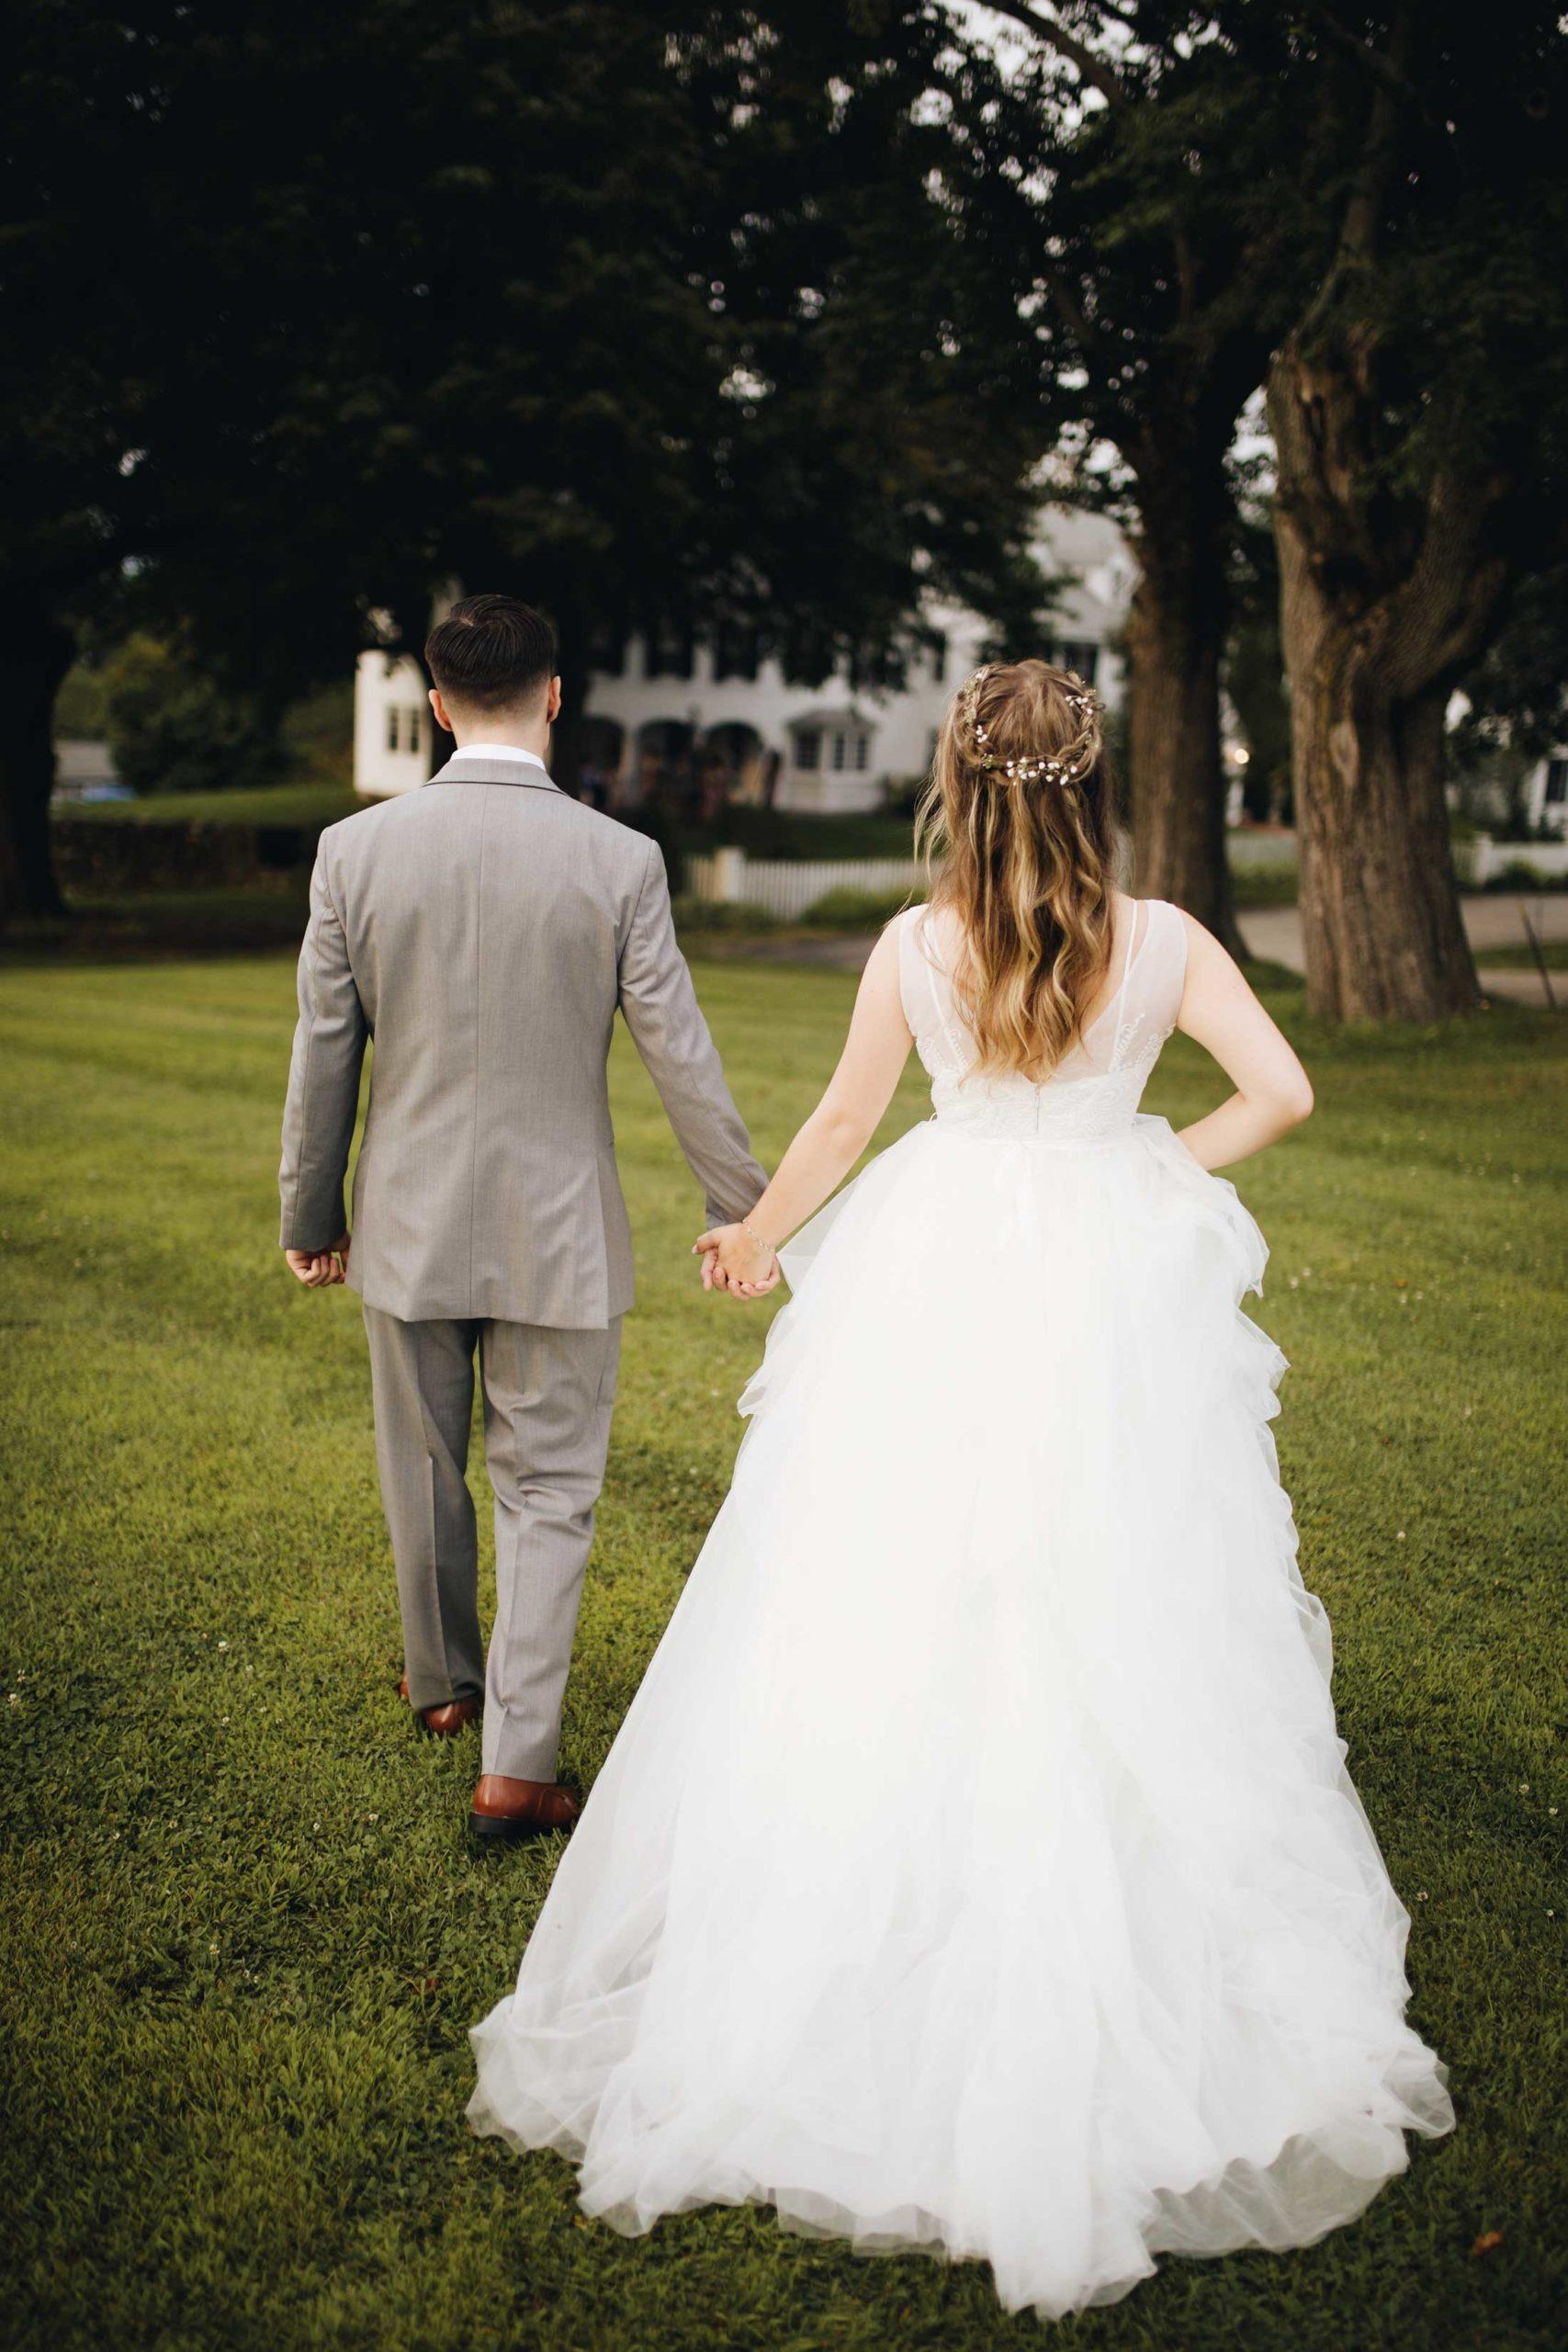 postponing-your-wedding-during-covid-19-9